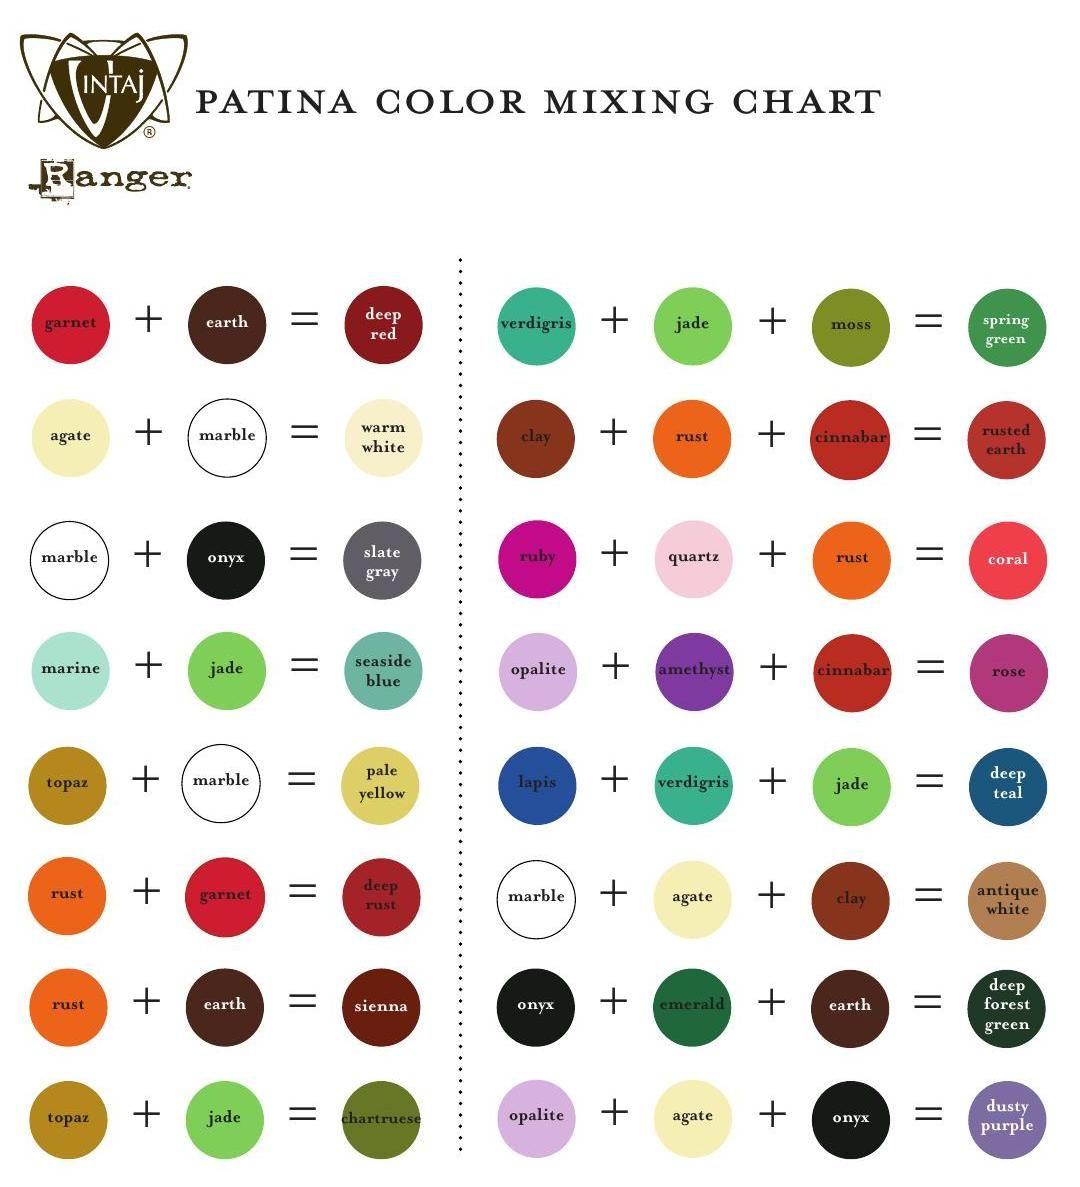 Patina color mixing chart mezclando colores de colores for Programa para combinar colores